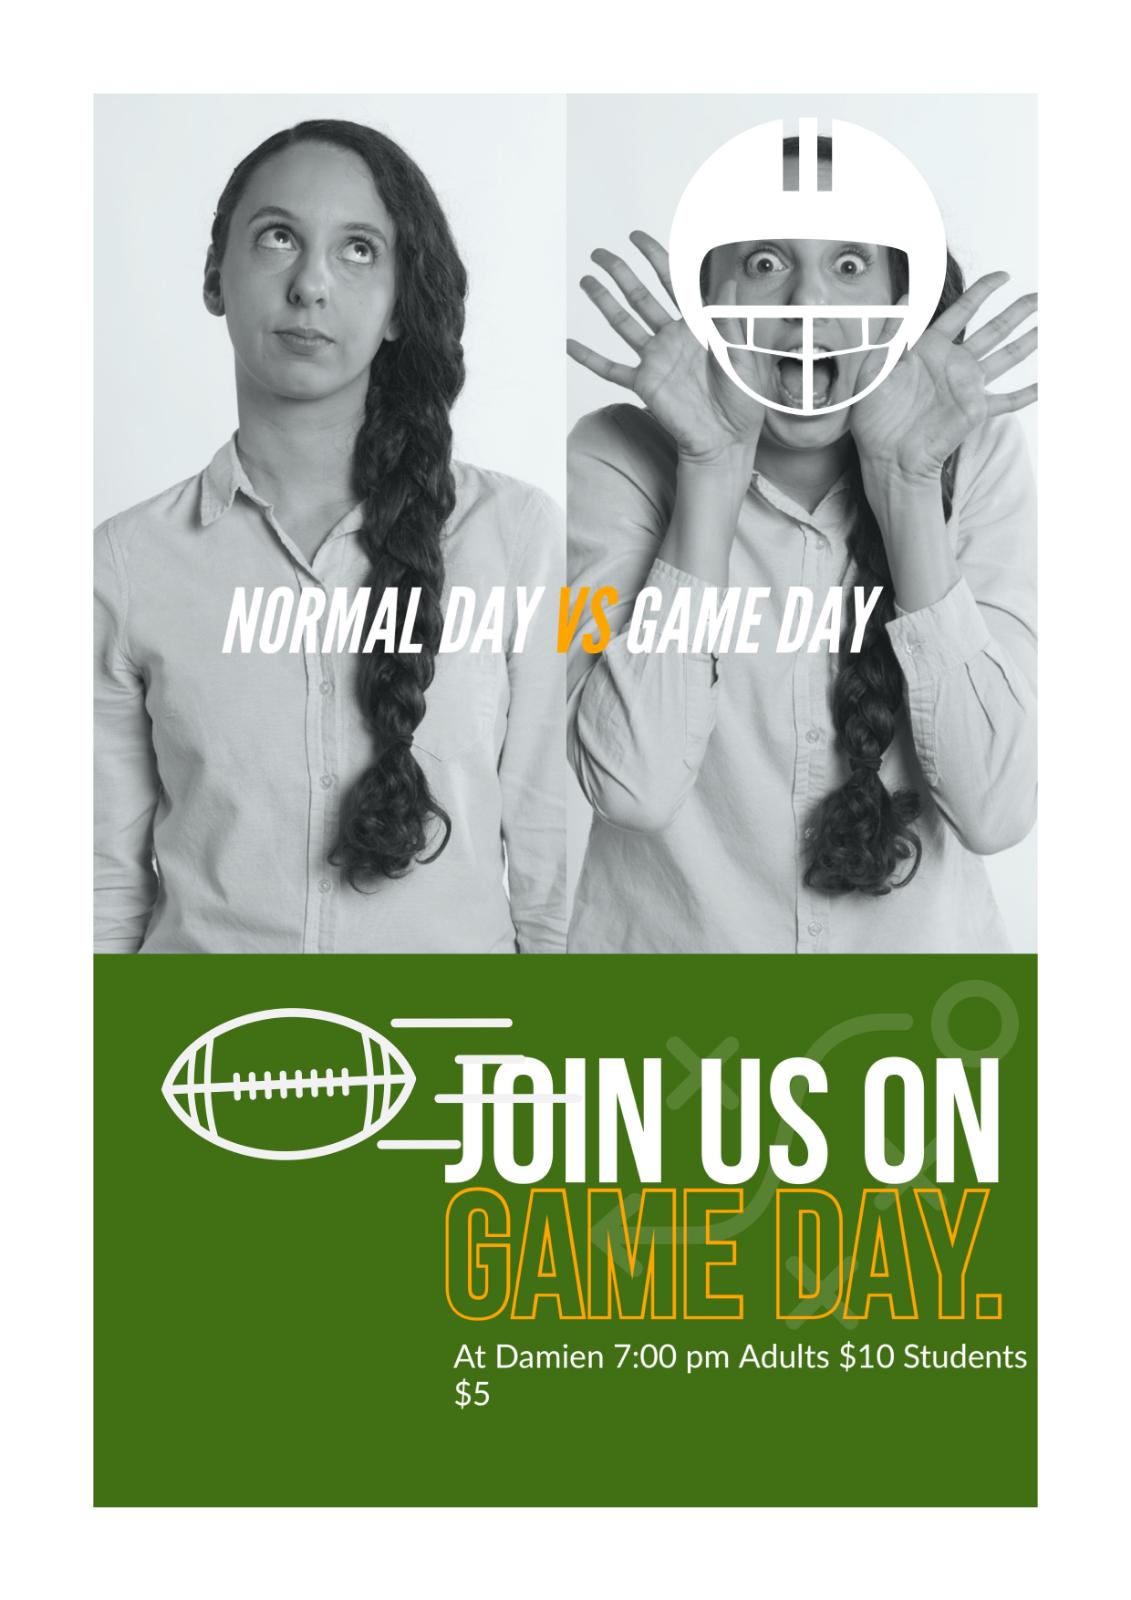 Football Tonight – Bonita vs Highland at Damien HS 7:00 pm